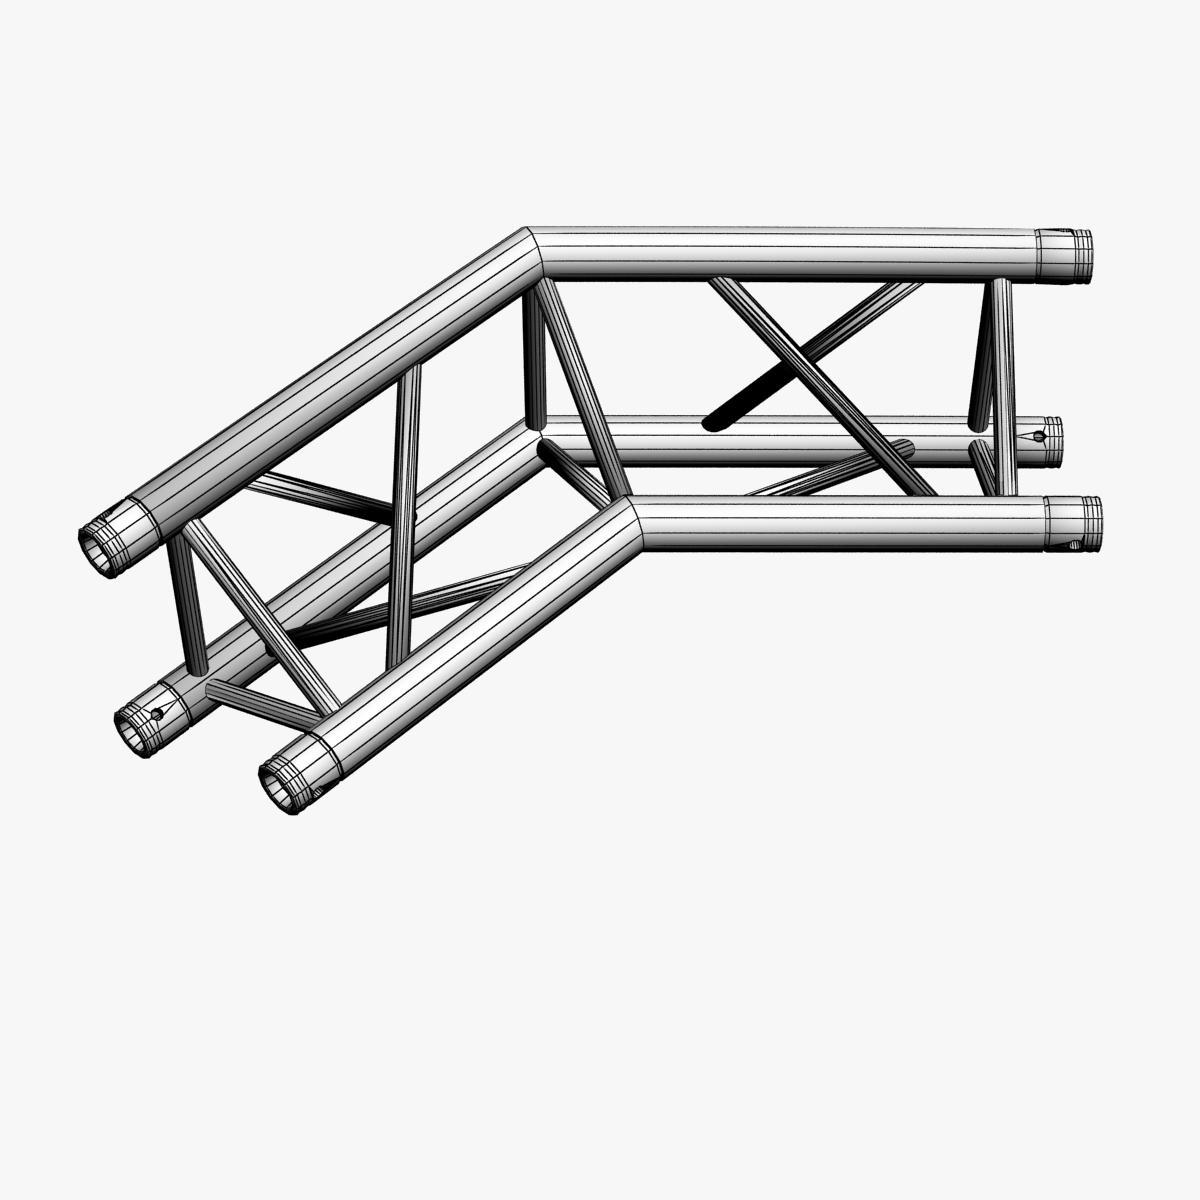 triangular trusses (collection 55 modular pieces) 3d model 3ds max dxf fbx c4d dae texture obj 216250